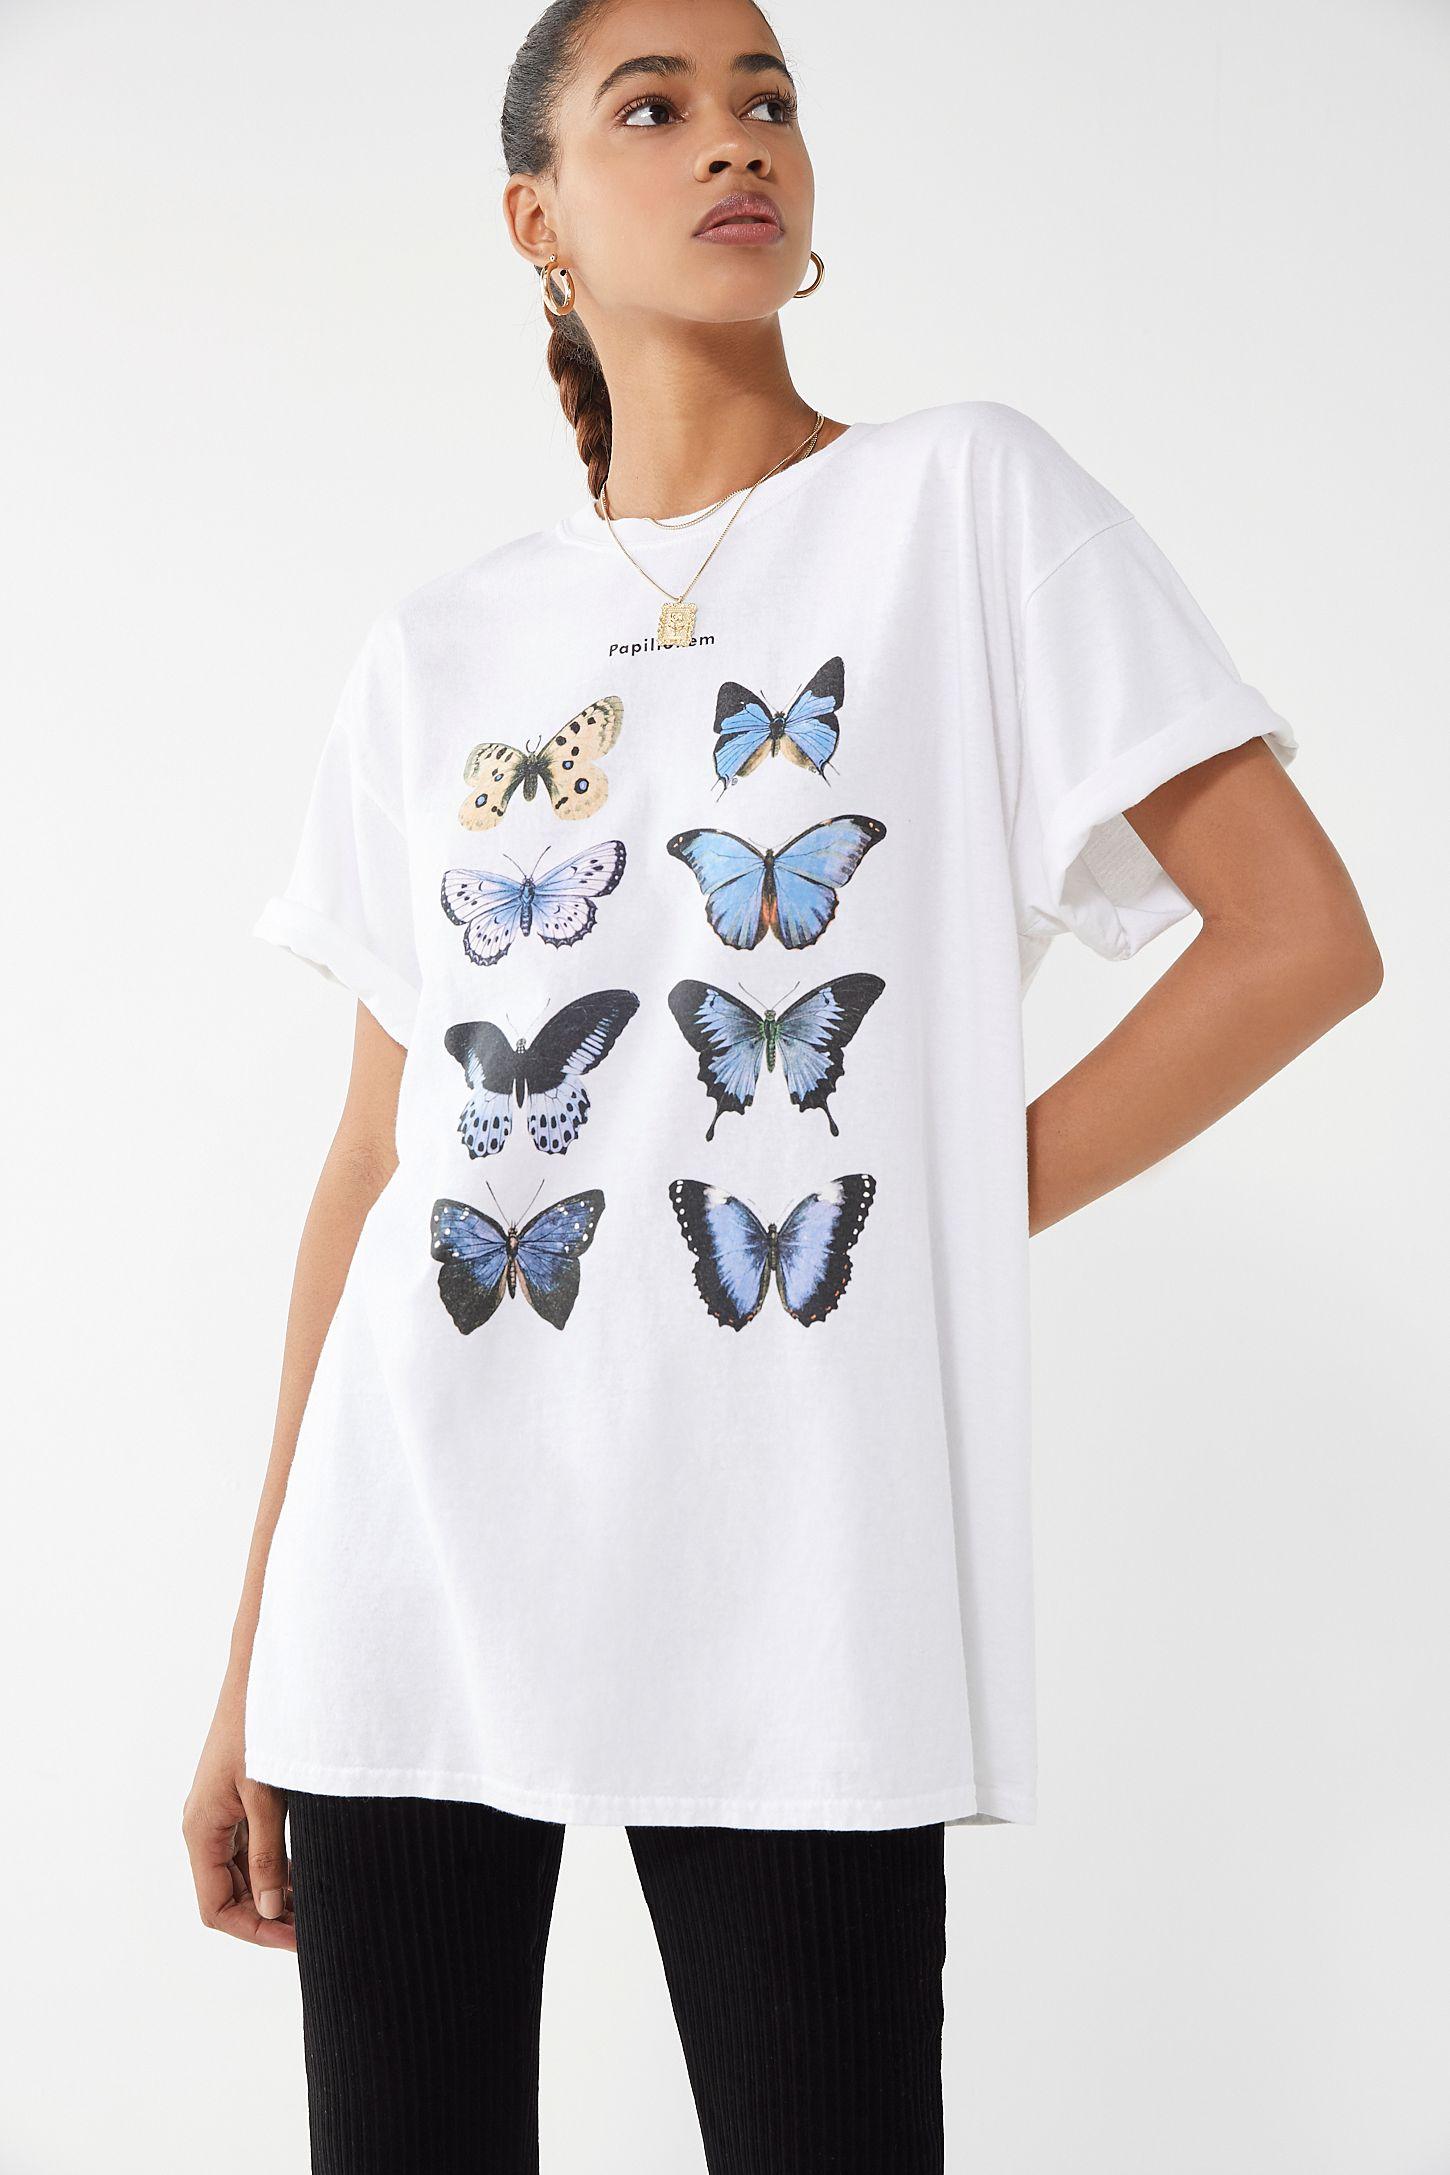 39bc90b67a9ebd Blue Butterfly Tee